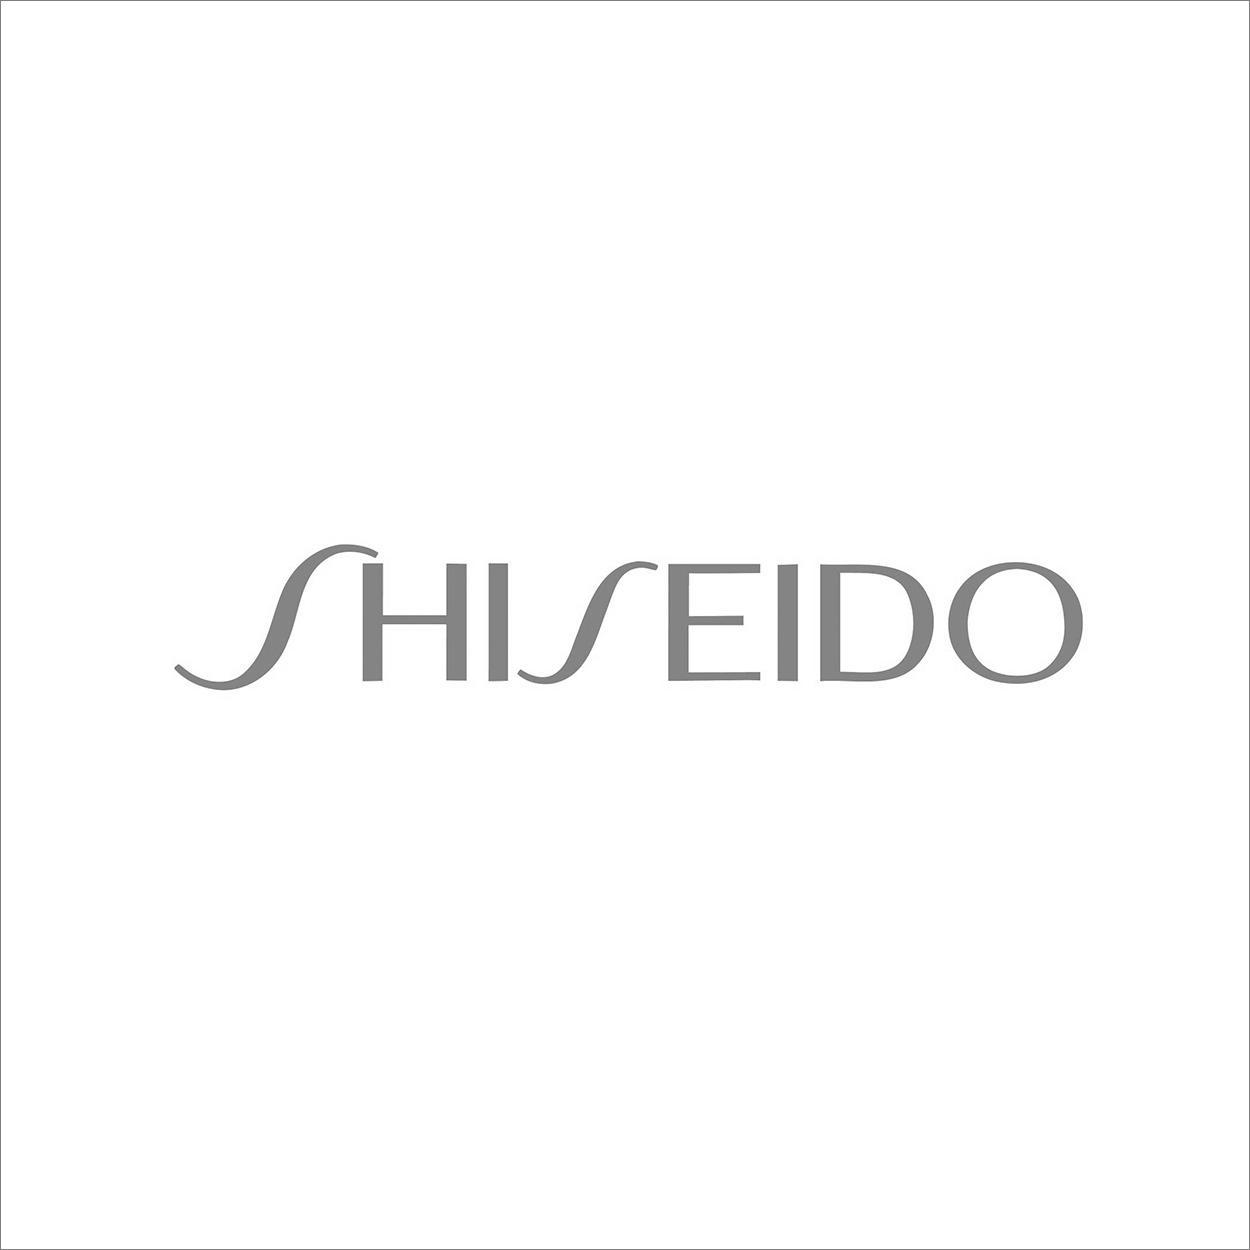 shiseido_logo.jpg